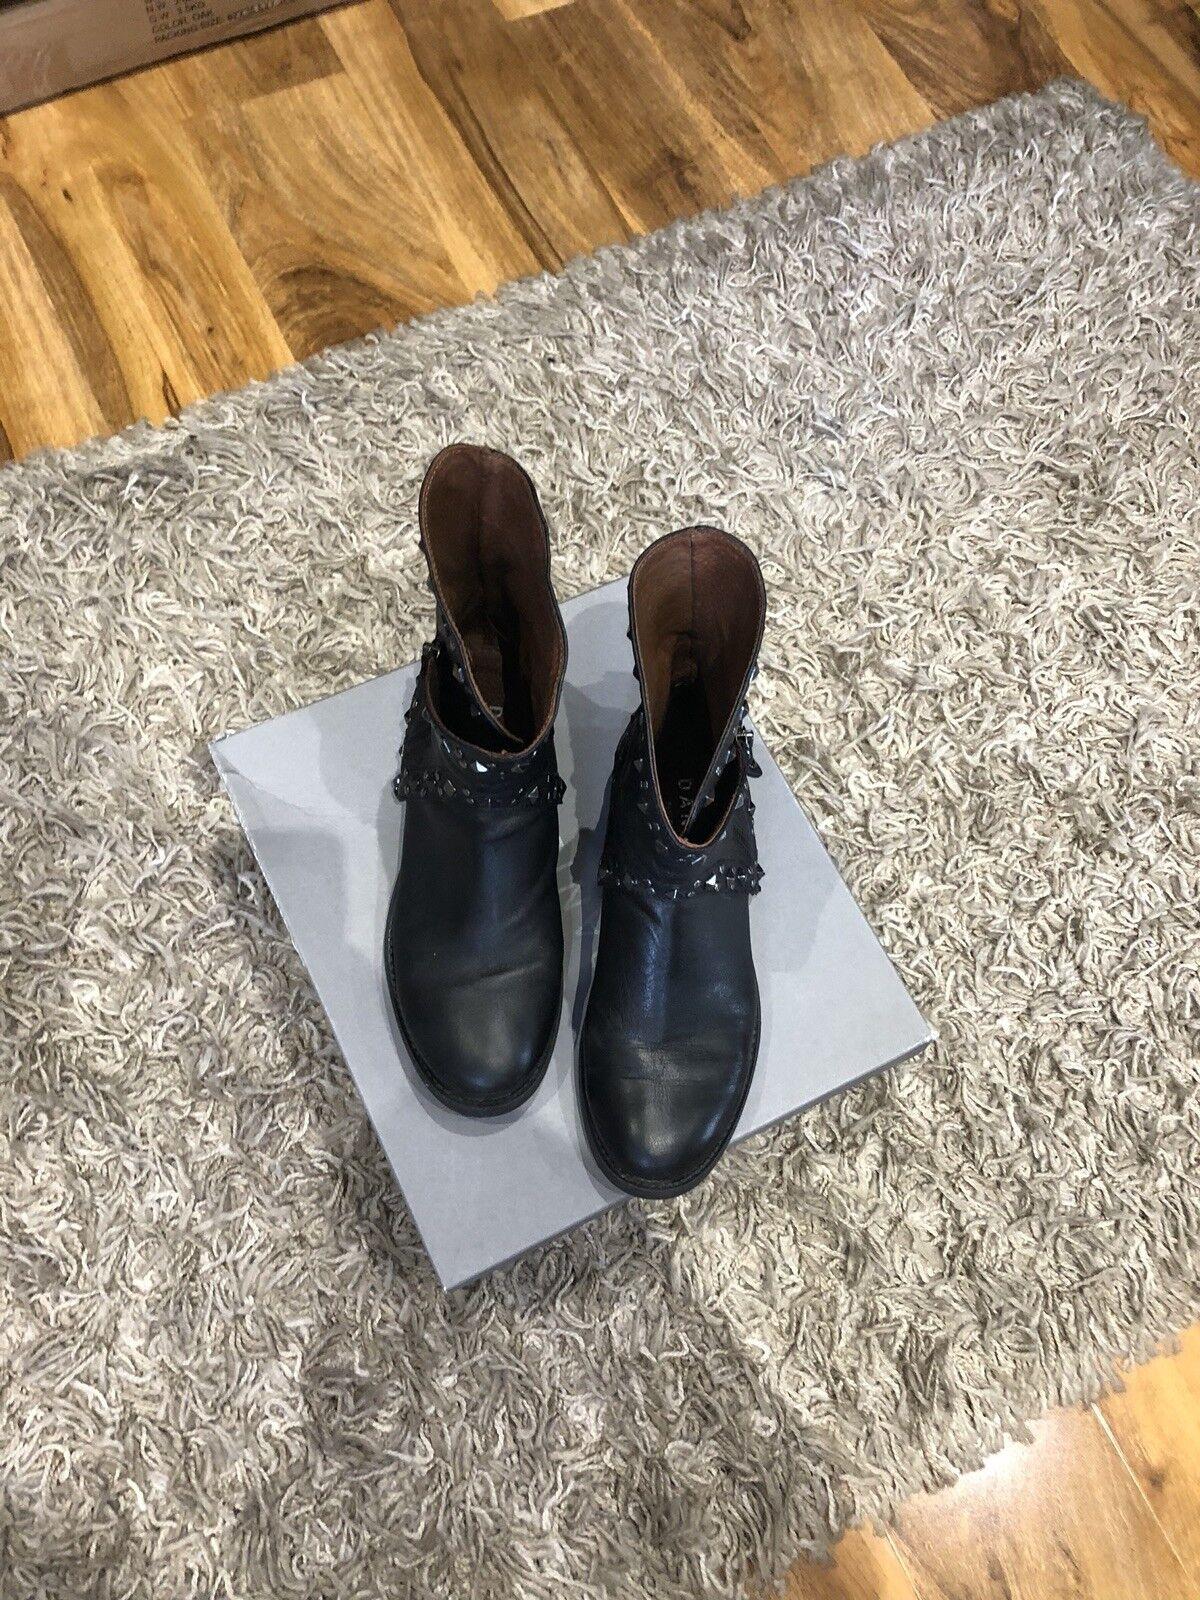 DANIEL damen LEATHER WINTER ANKLE Stiefel COMBAT FLAT schuhe Größe 4 (37)